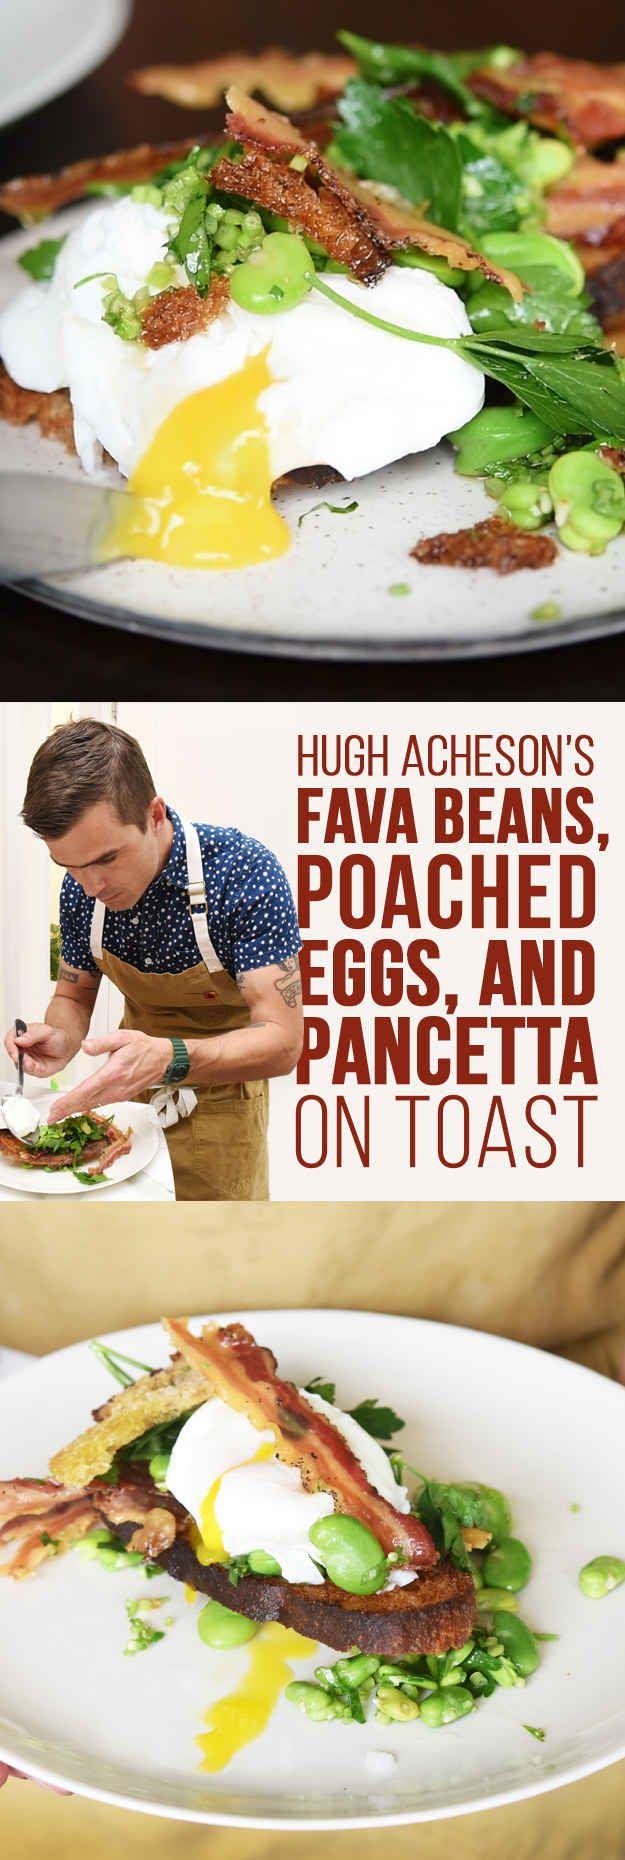 Here's How Chef Hugh Acheson Makes An Egg On Toast